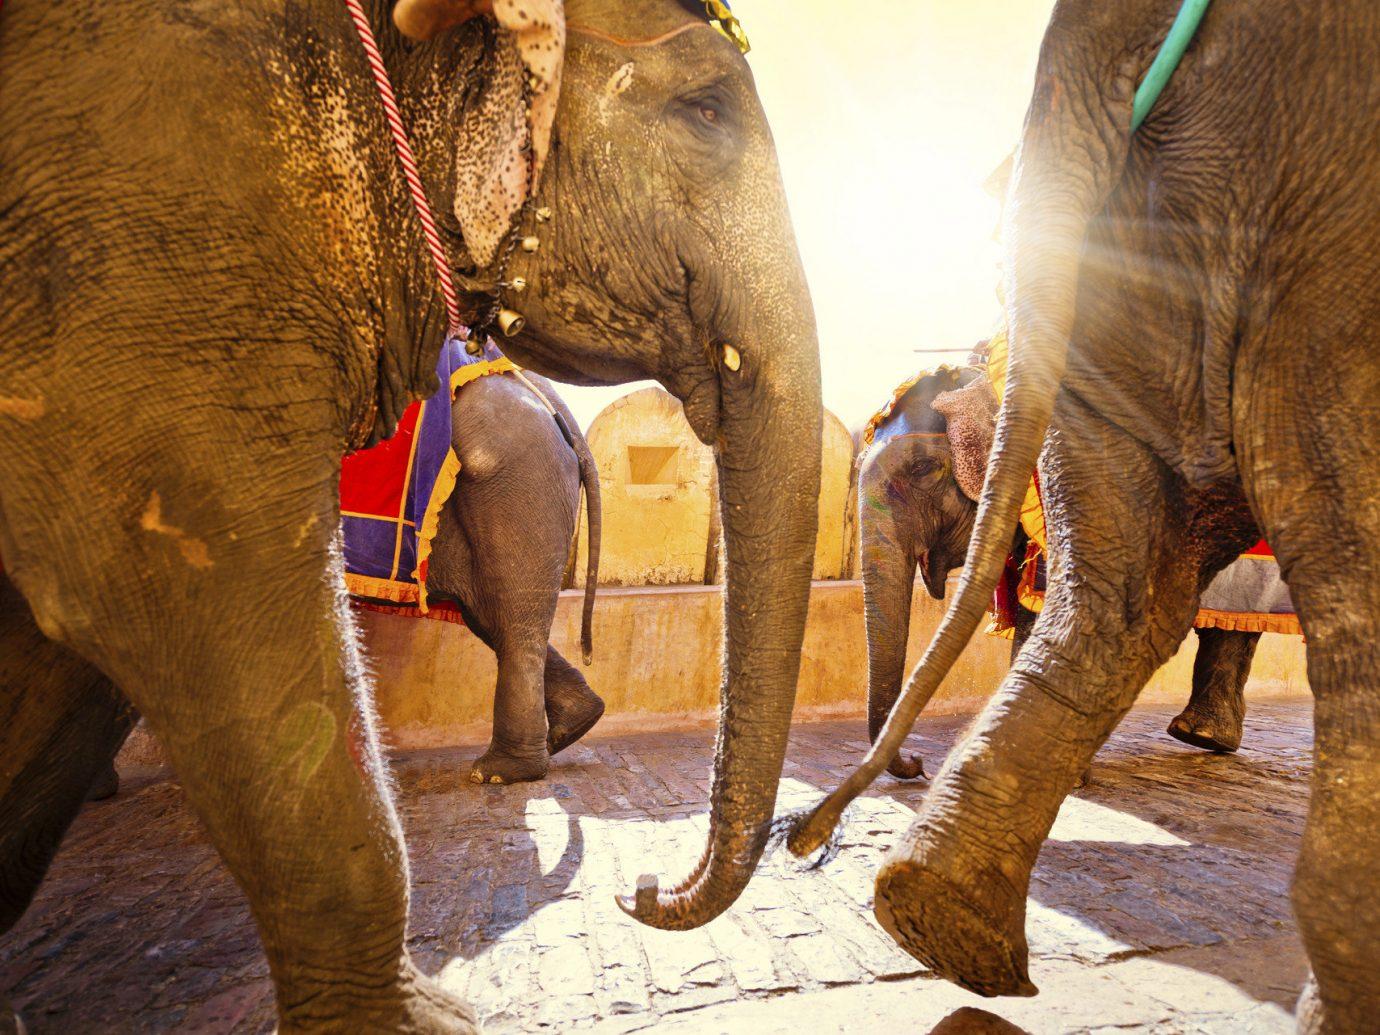 Travel Tips elephant ground outdoor indian elephant elephants and mammoths animal mammal fauna mahout Wildlife zoo trunk